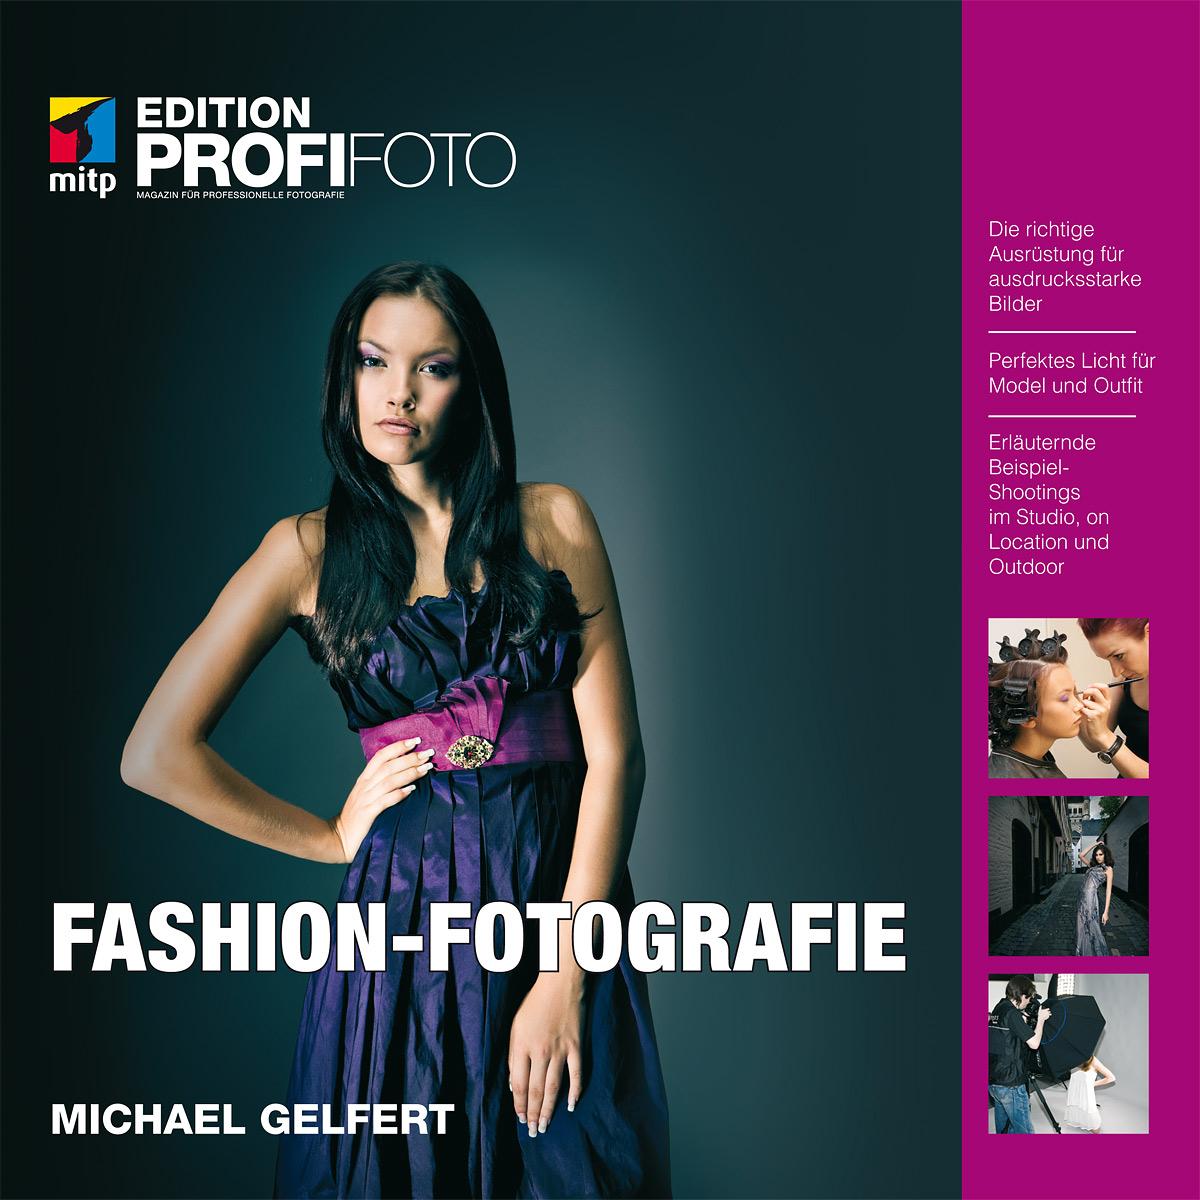 Fashion-Fotografie - Das Buch!